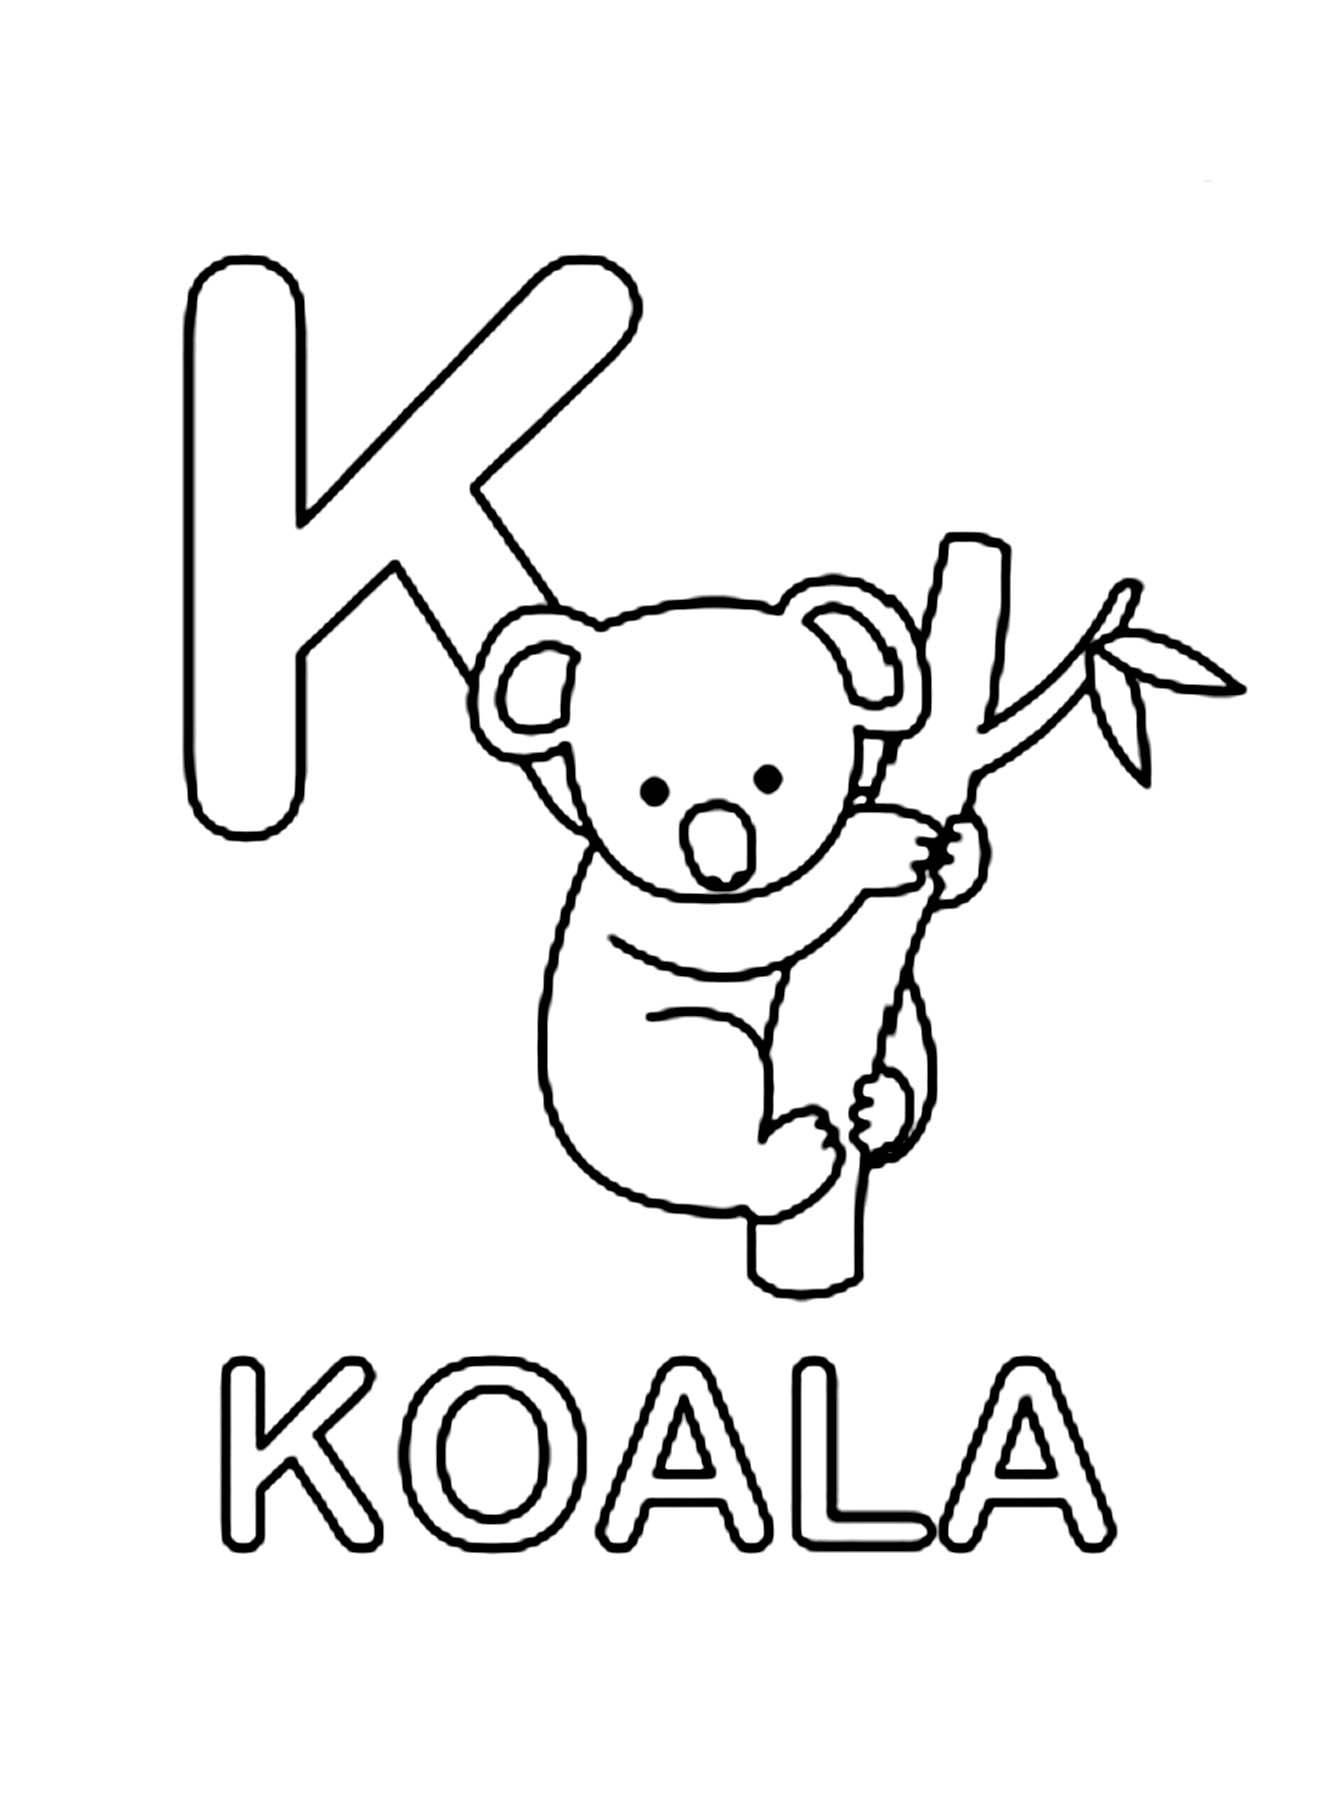 Image de koala a dessiner